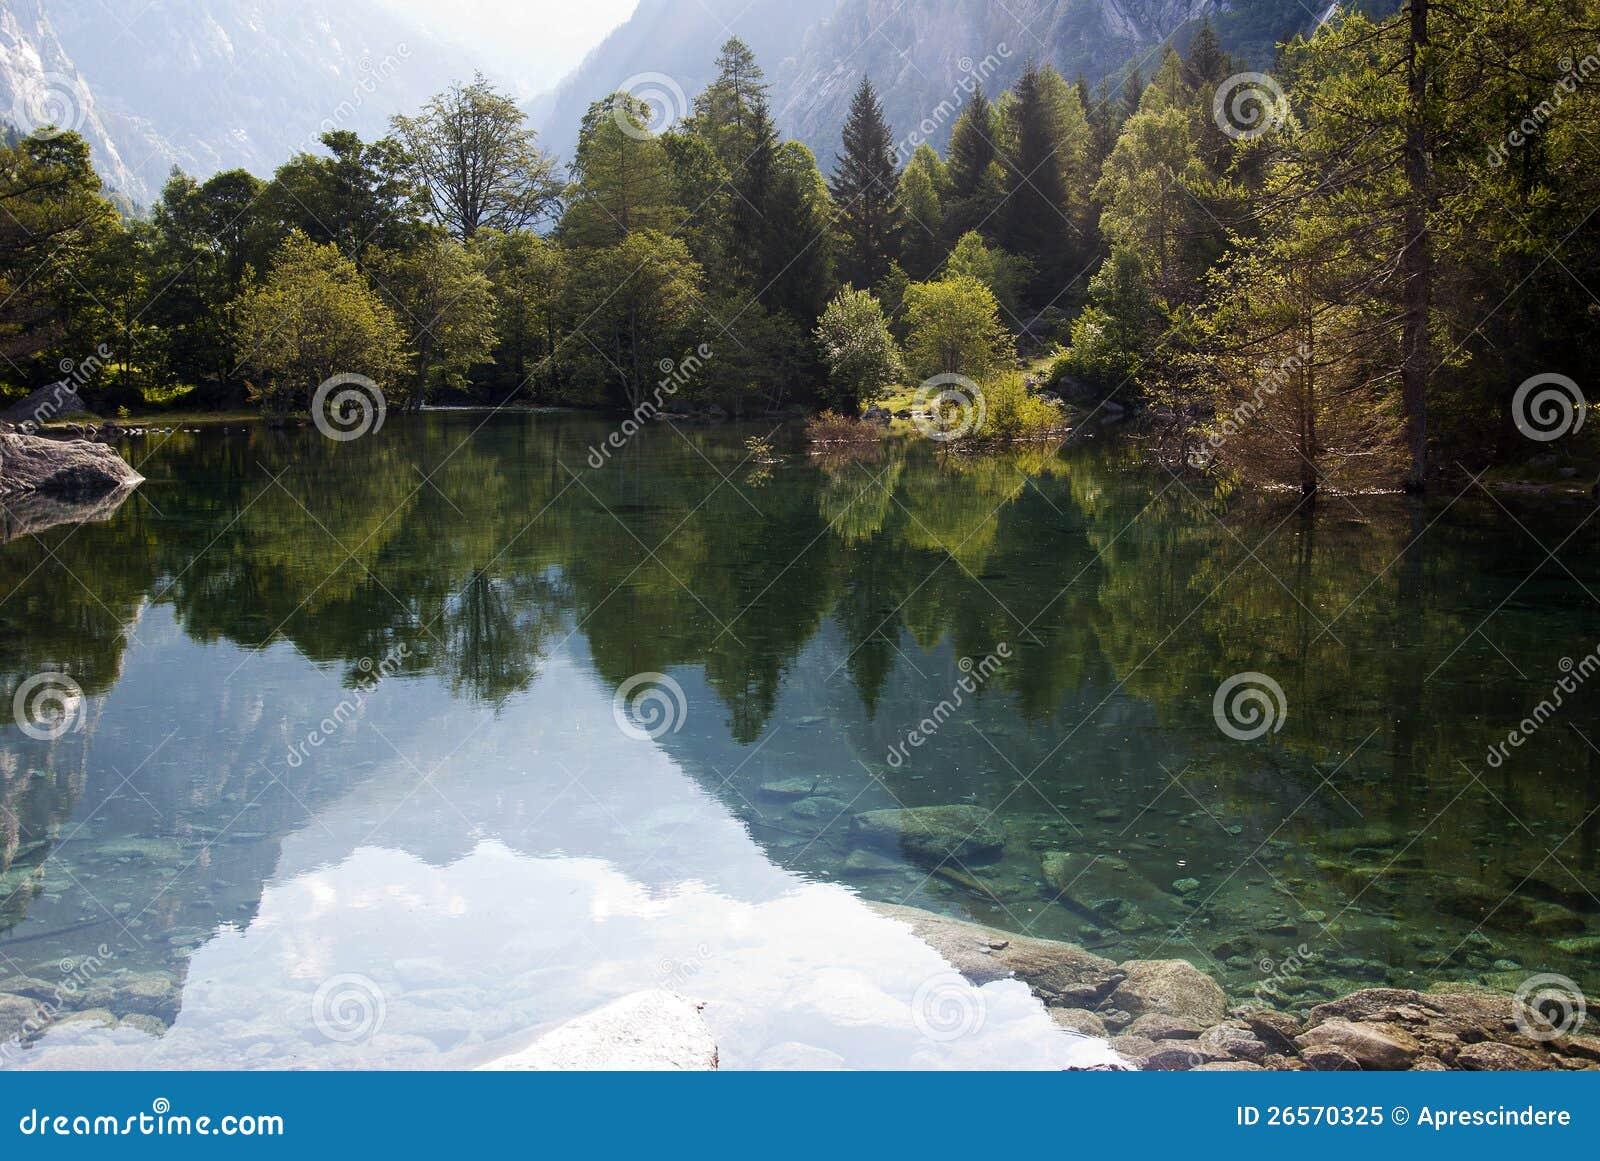 Alpin lake